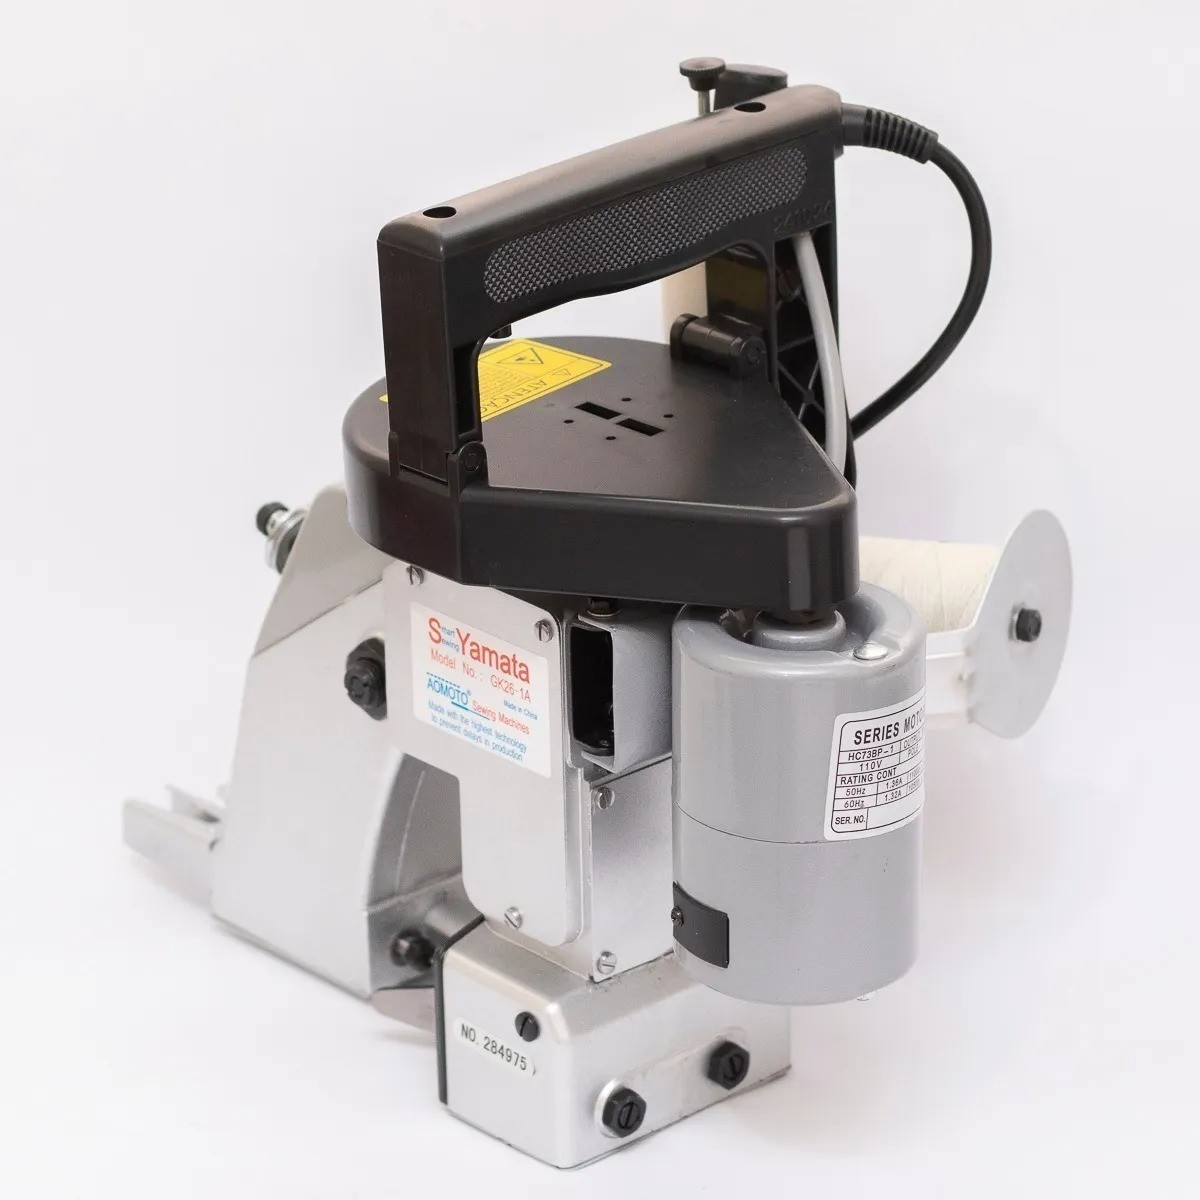 Máquina para costurar e fechar boca de saco YAMATA GK-261A